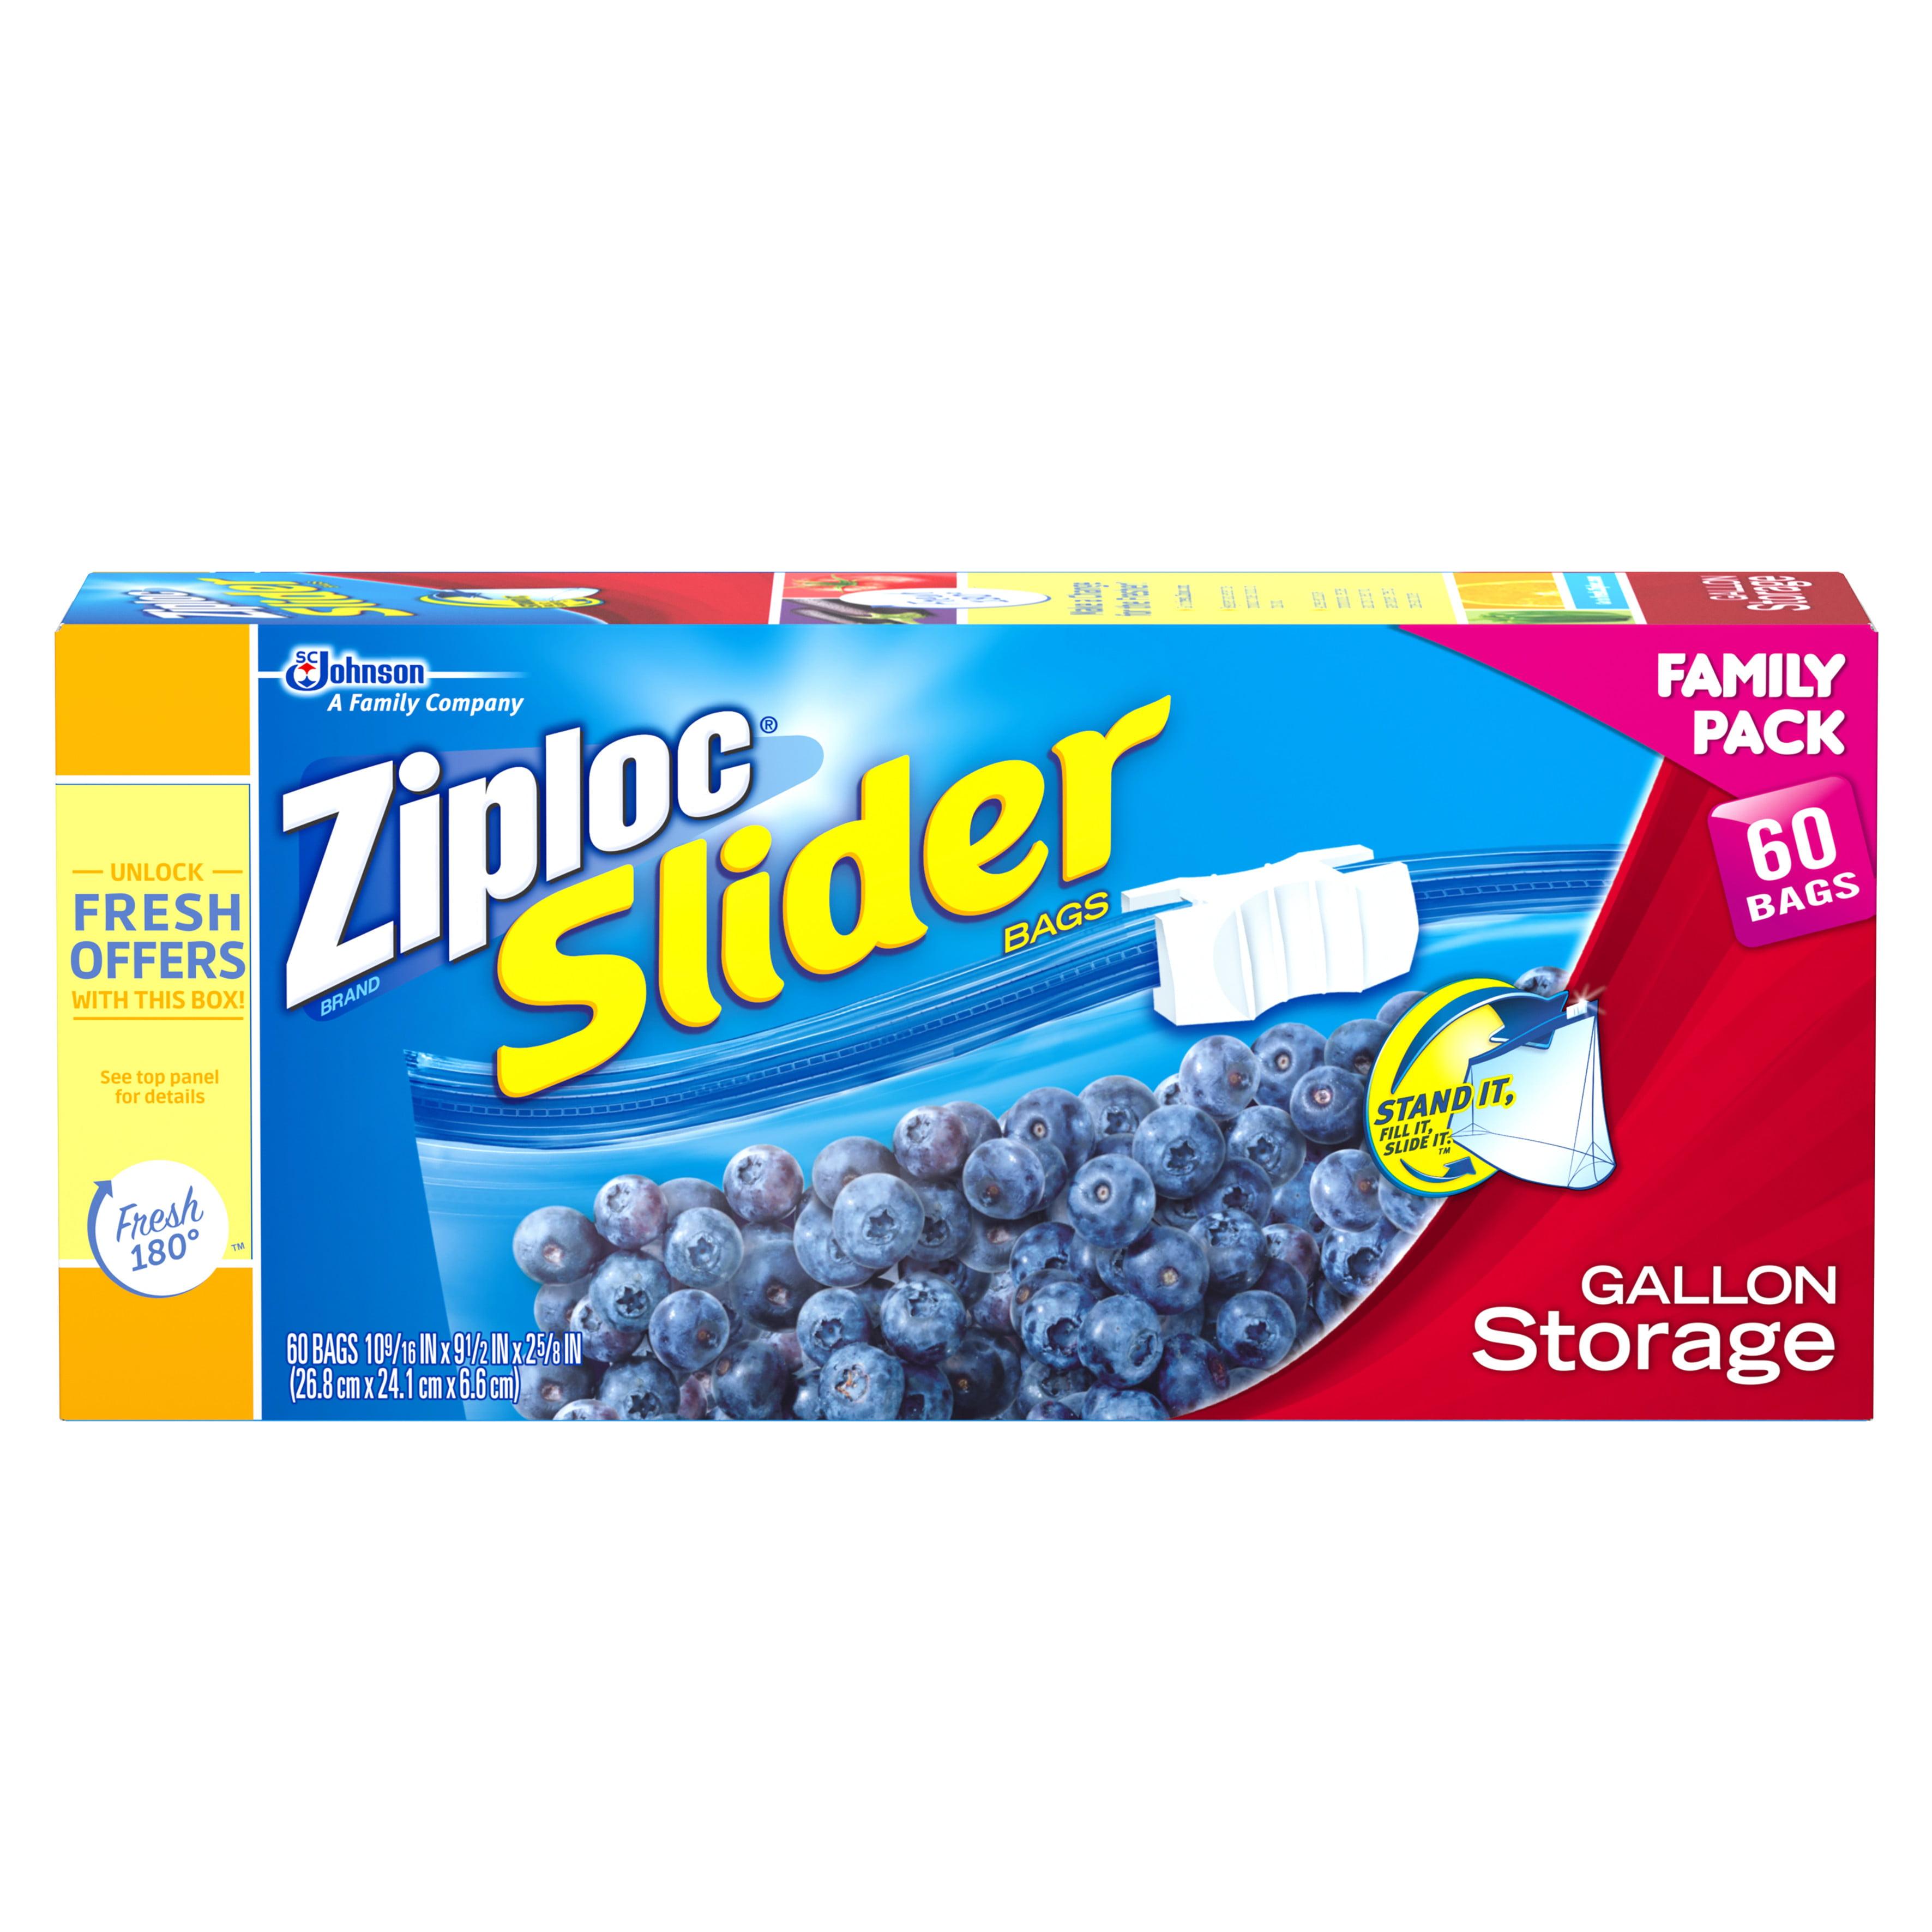 Ziploc Slider Storage Gallon Family Pack 60 Count